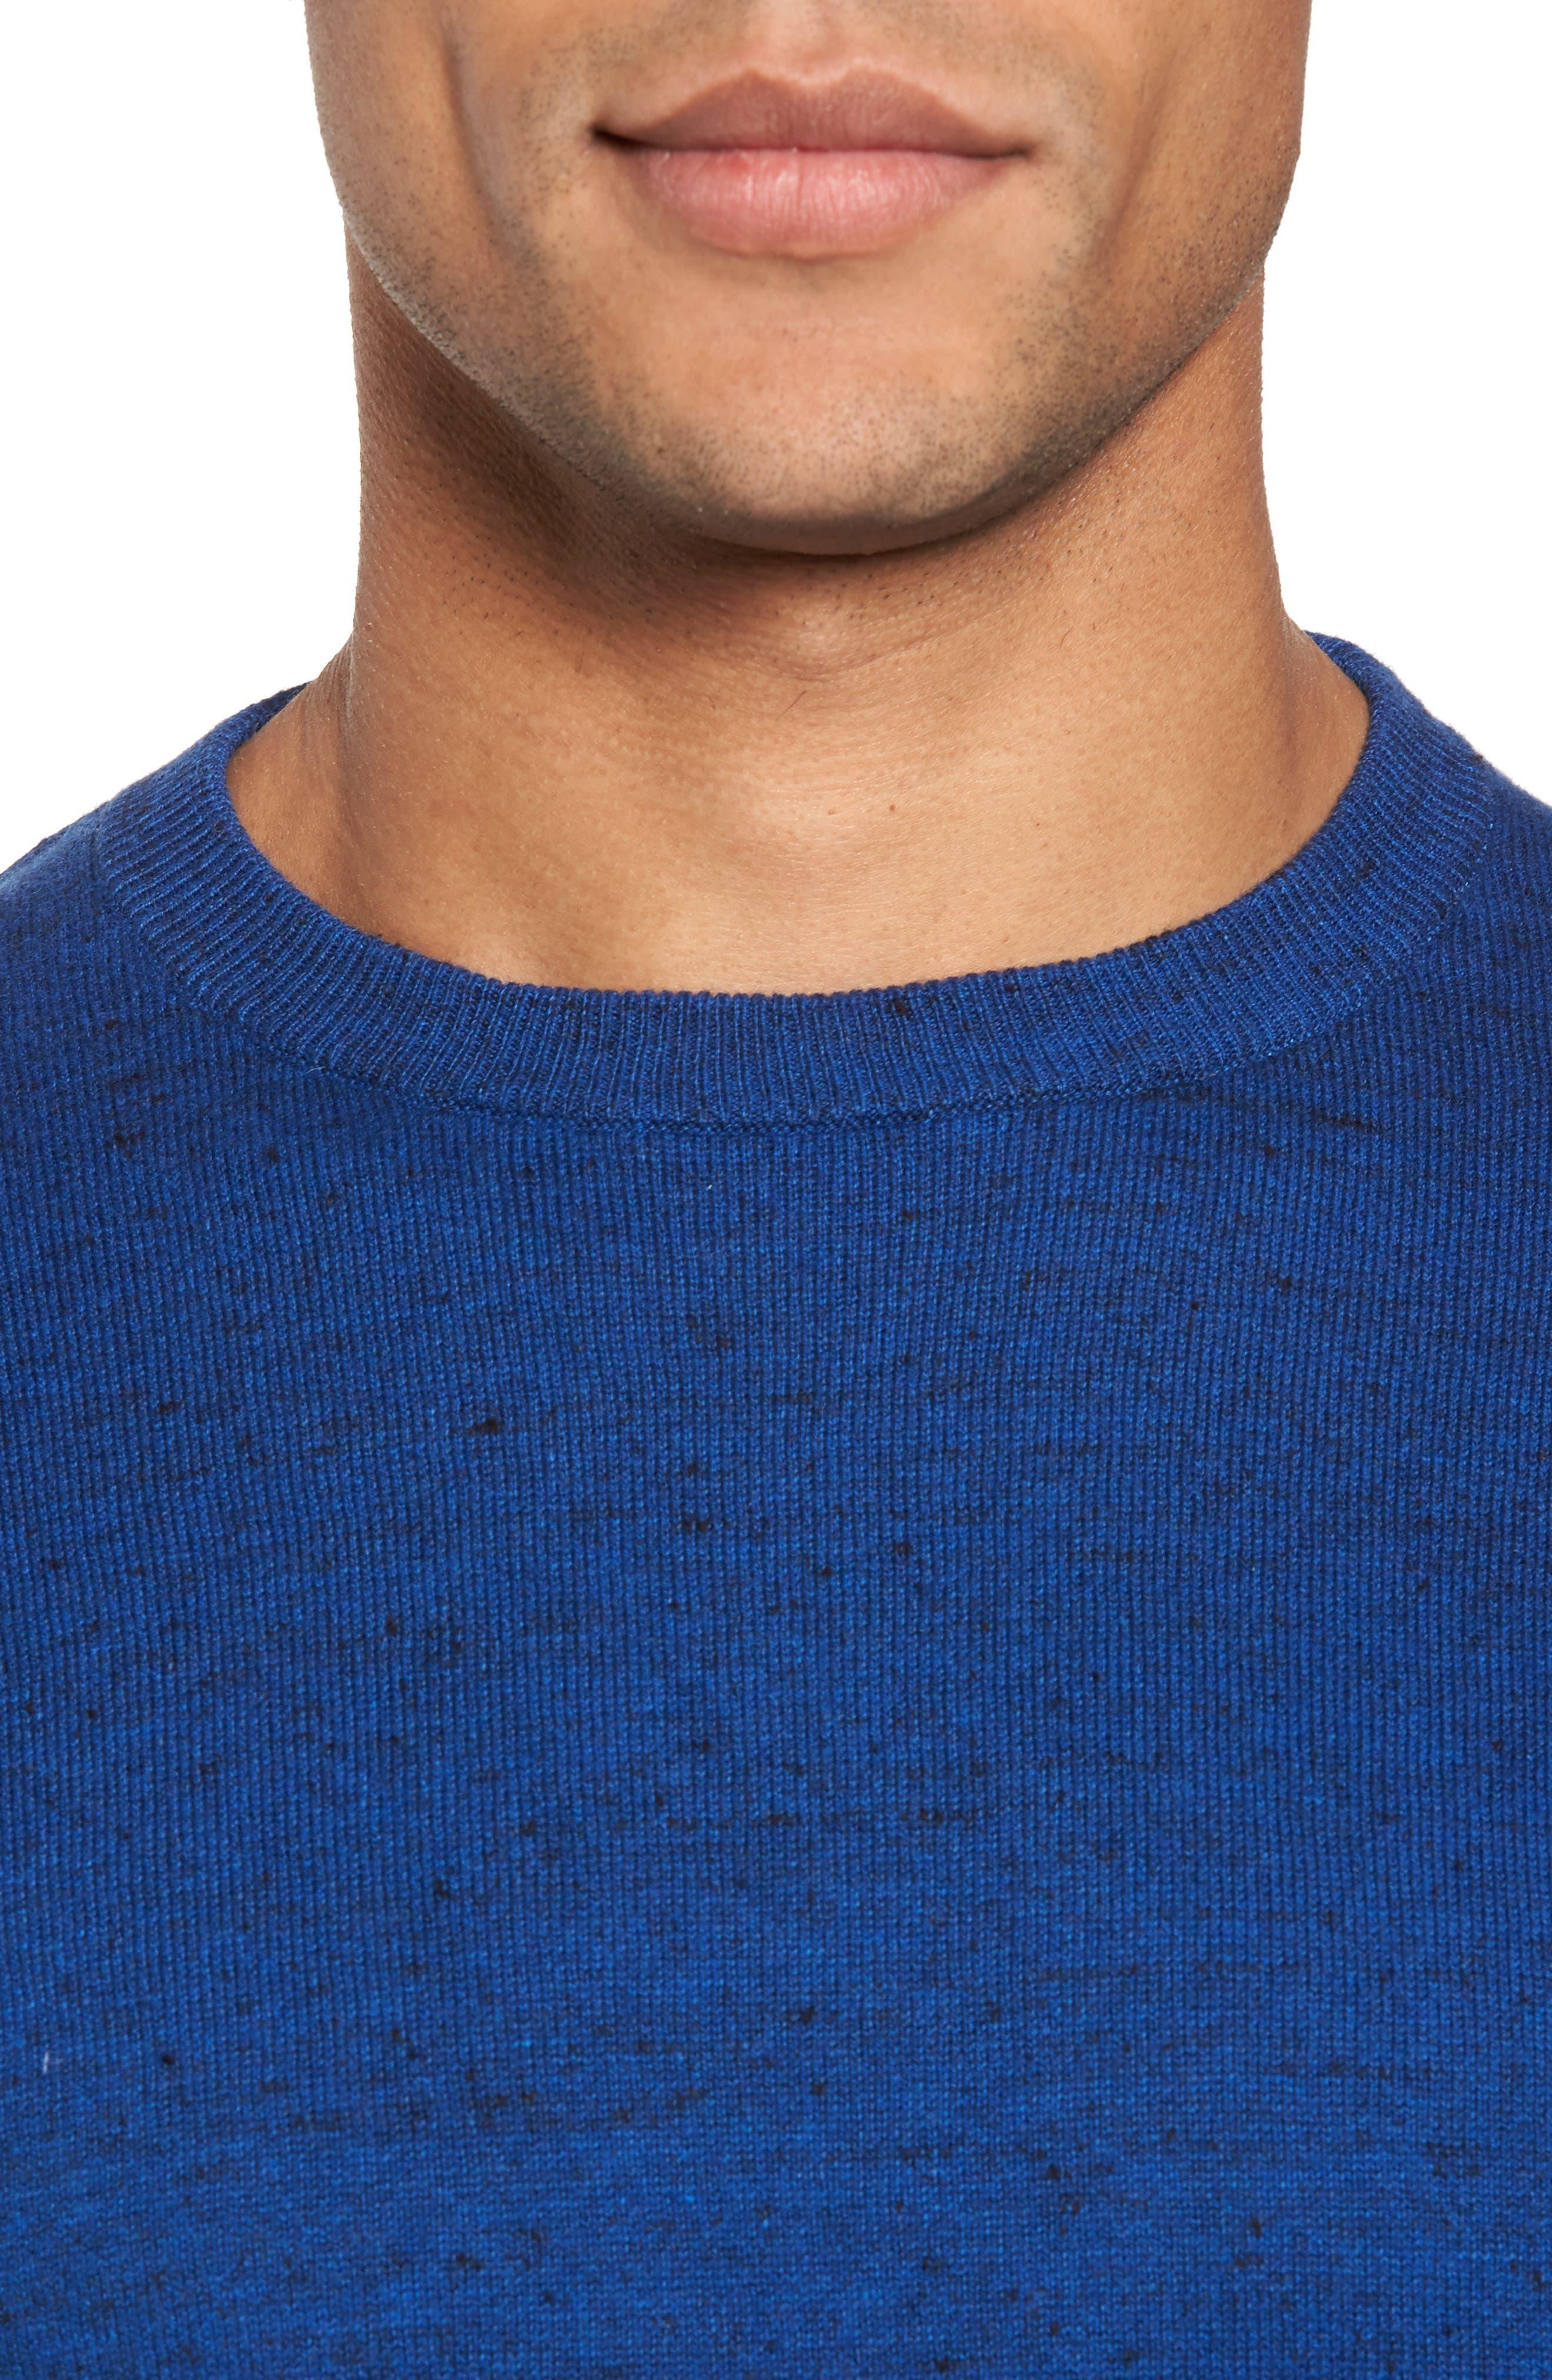 Alternate Image 4  - Nordstrom Men's Shop Cotton & Cashmere Crewneck Sweater (Regular & Tall)